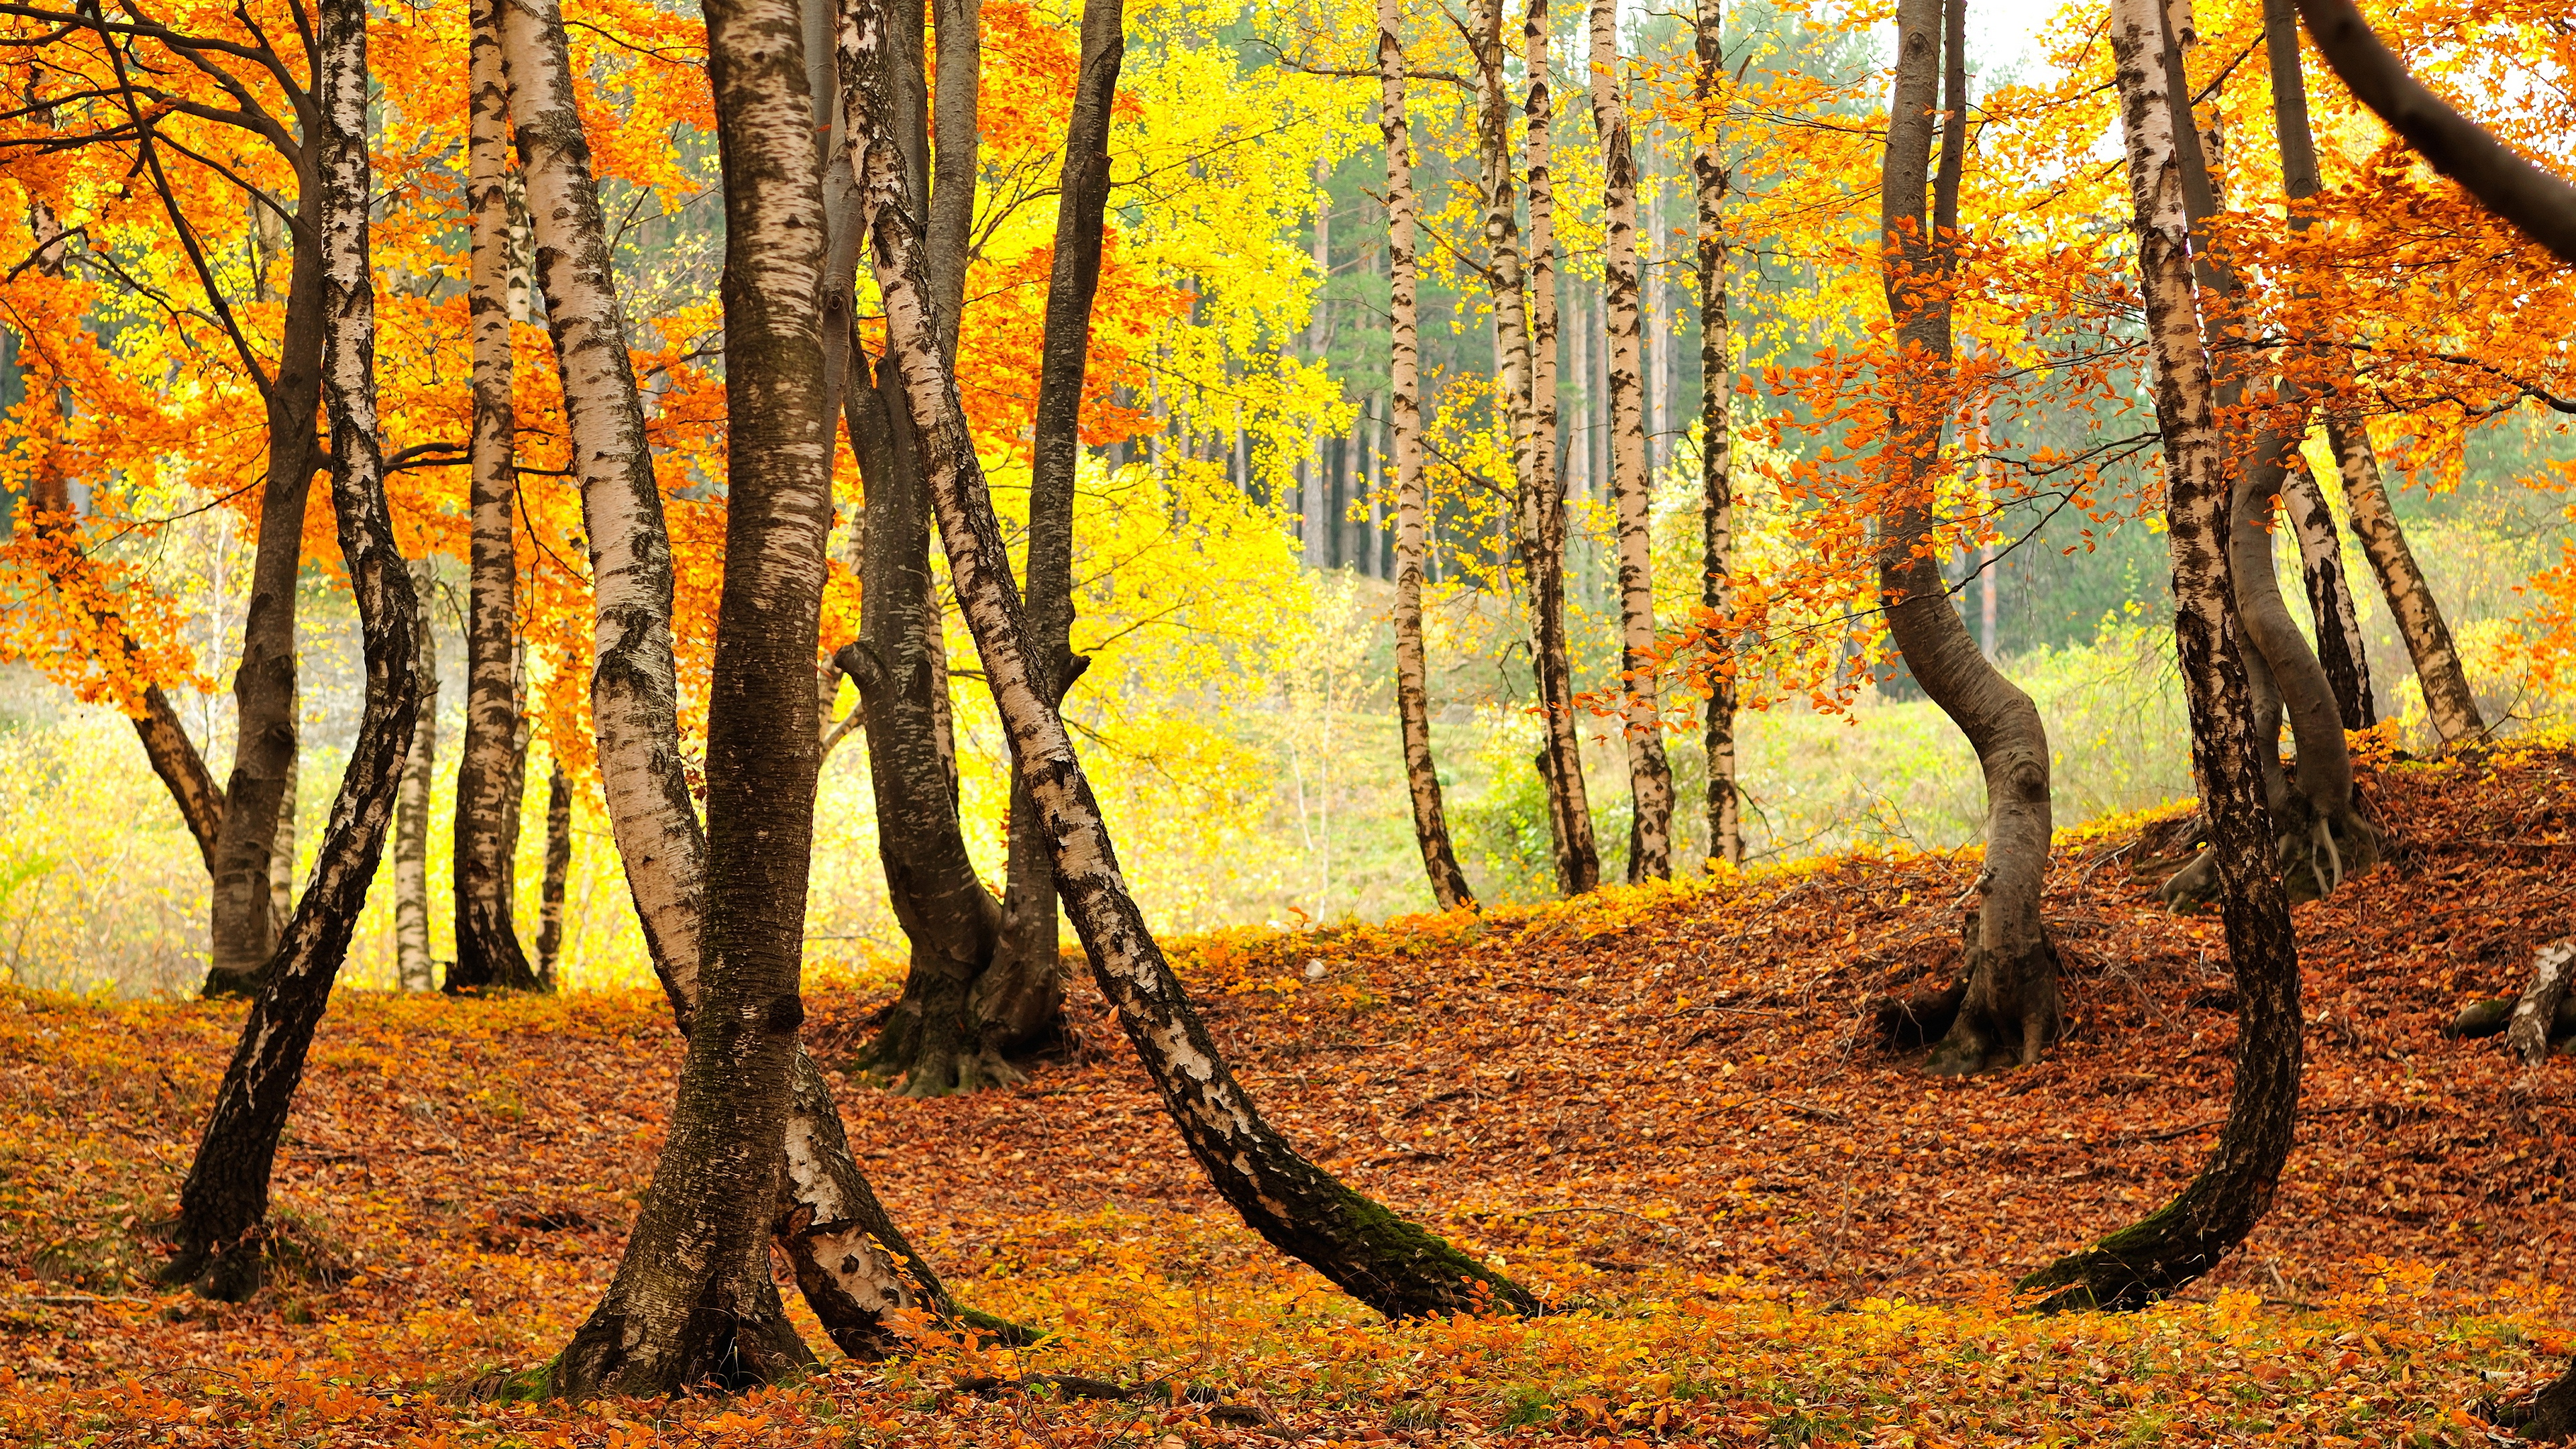 fall nature trees leaves